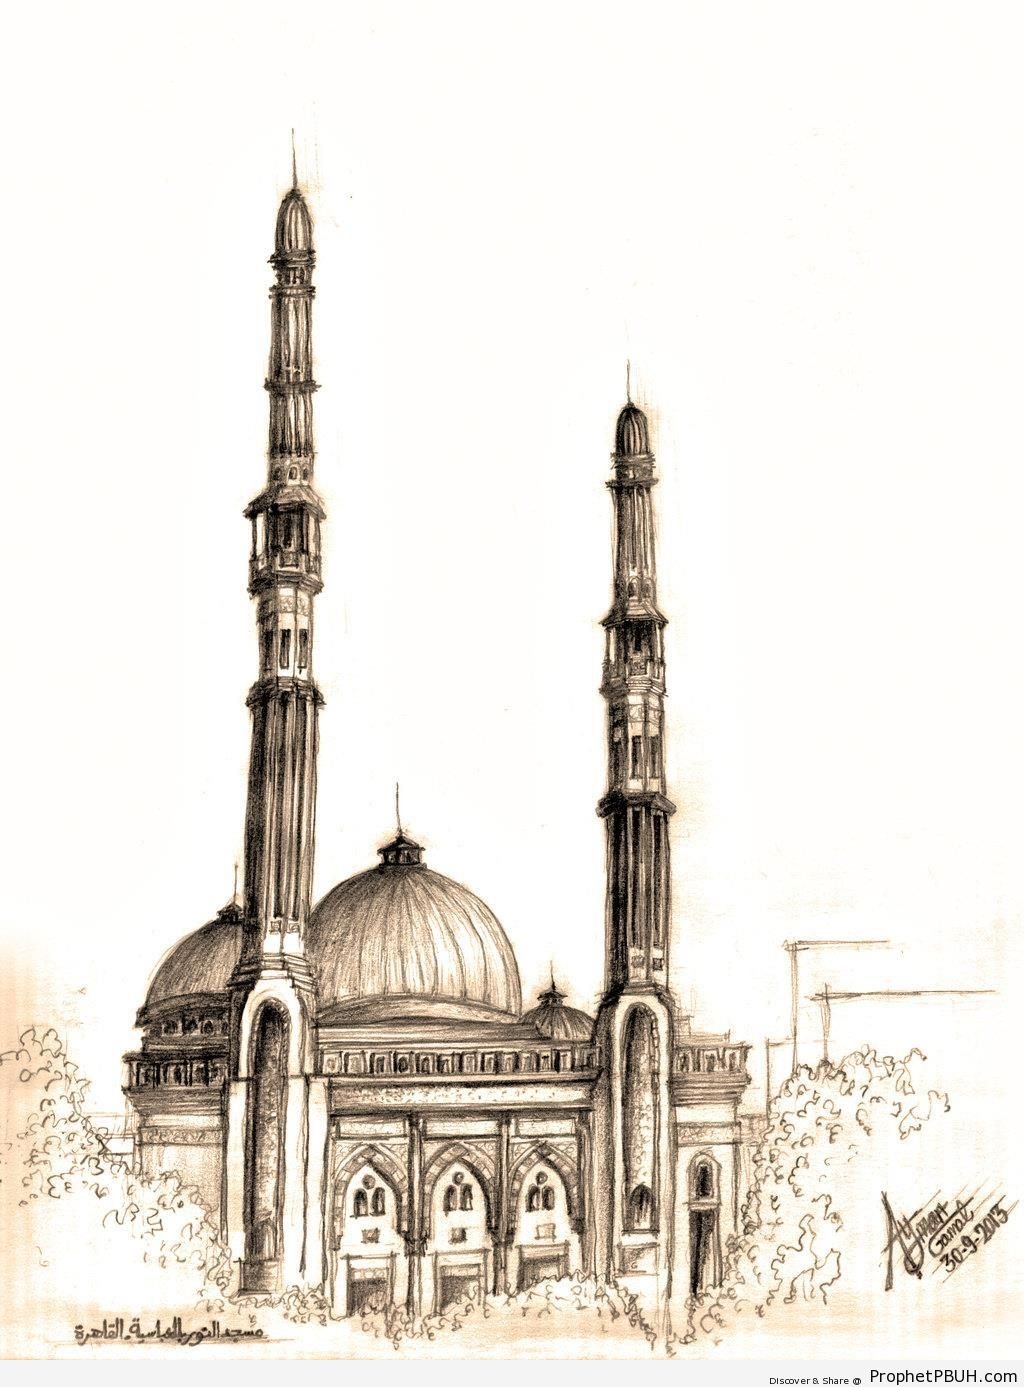 Drawing of El-Nour Mosque, Cairo, Egypt - Al-Nour Mosque (Masjid El-Noor) in Cairo, Egypt -Picture